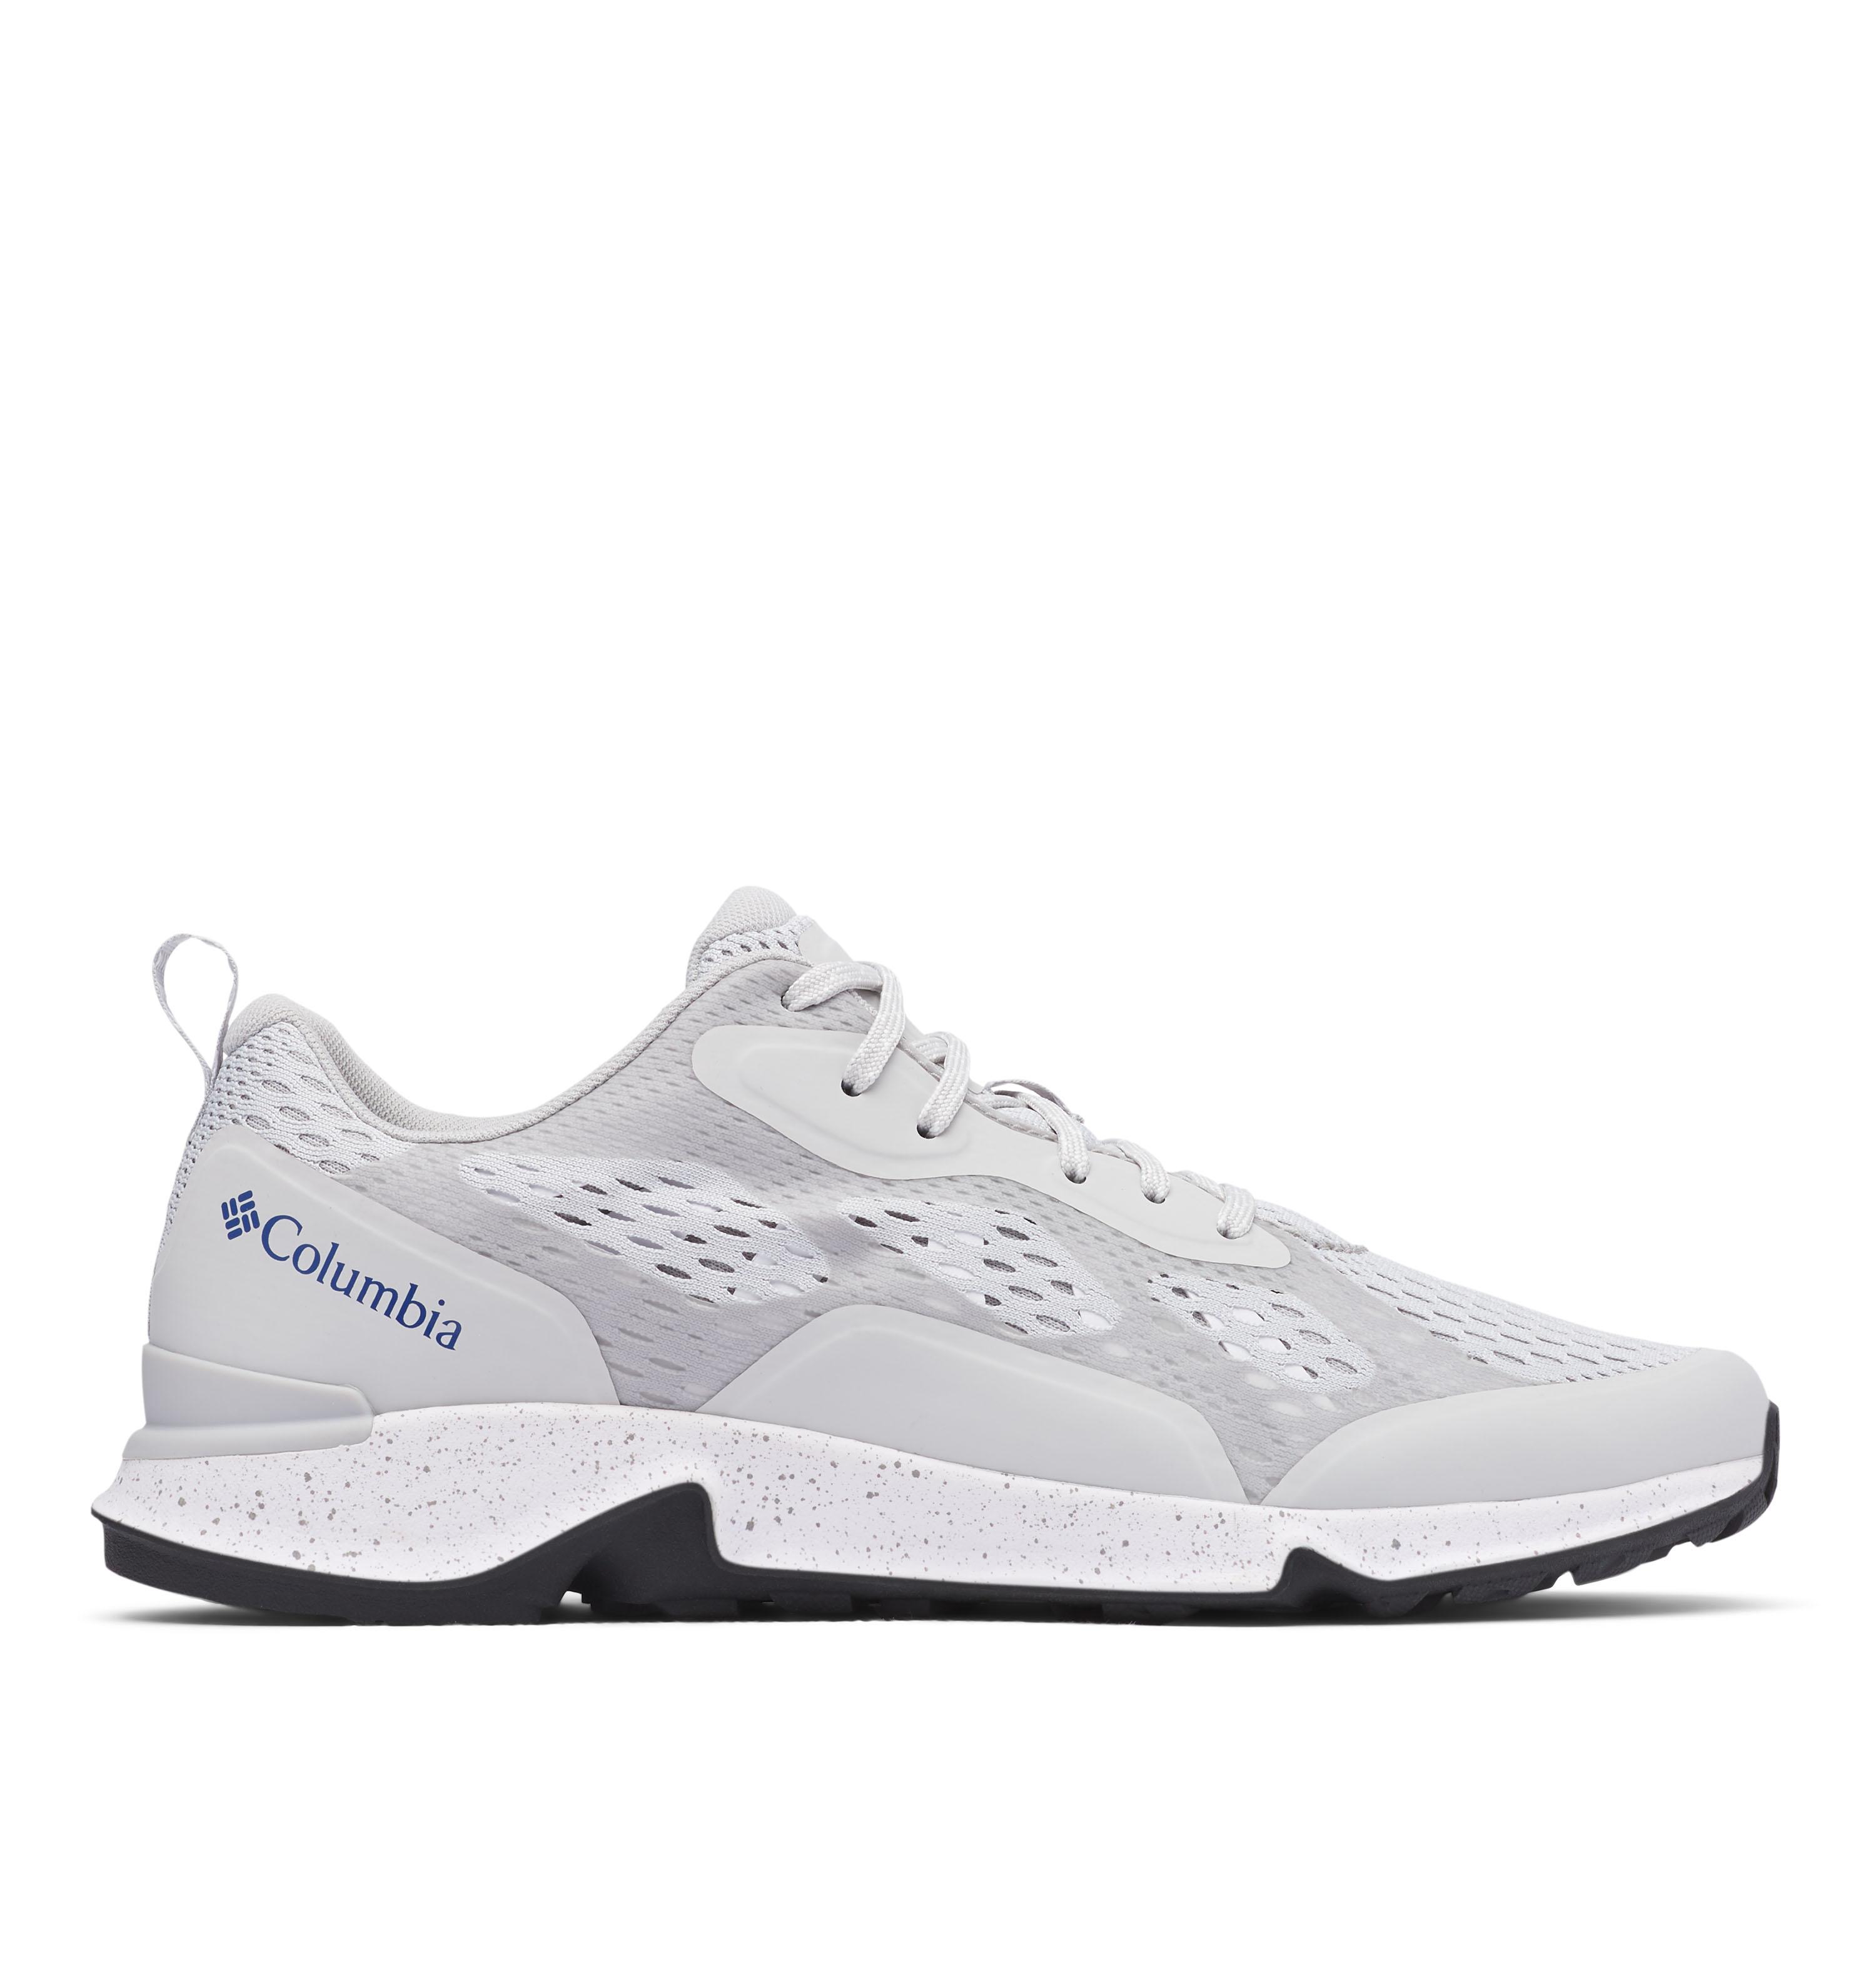 Comprar Columbia Vitesse grey / Omni-Grip sapatos /